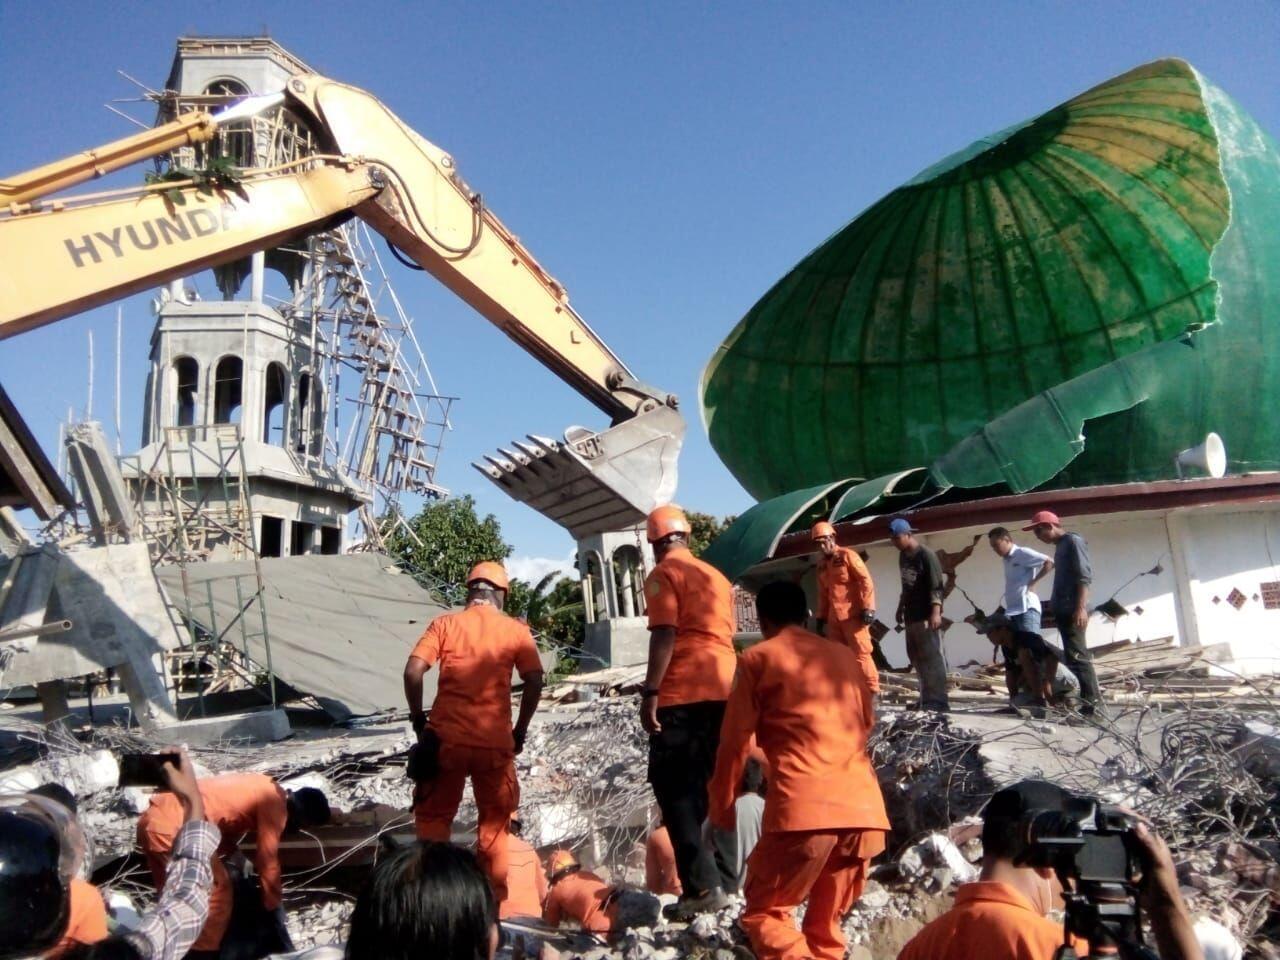 Bertambah 7 Orang, Korban Meninggal Akibat Gempa Lombok Jadi 105 Jiwa